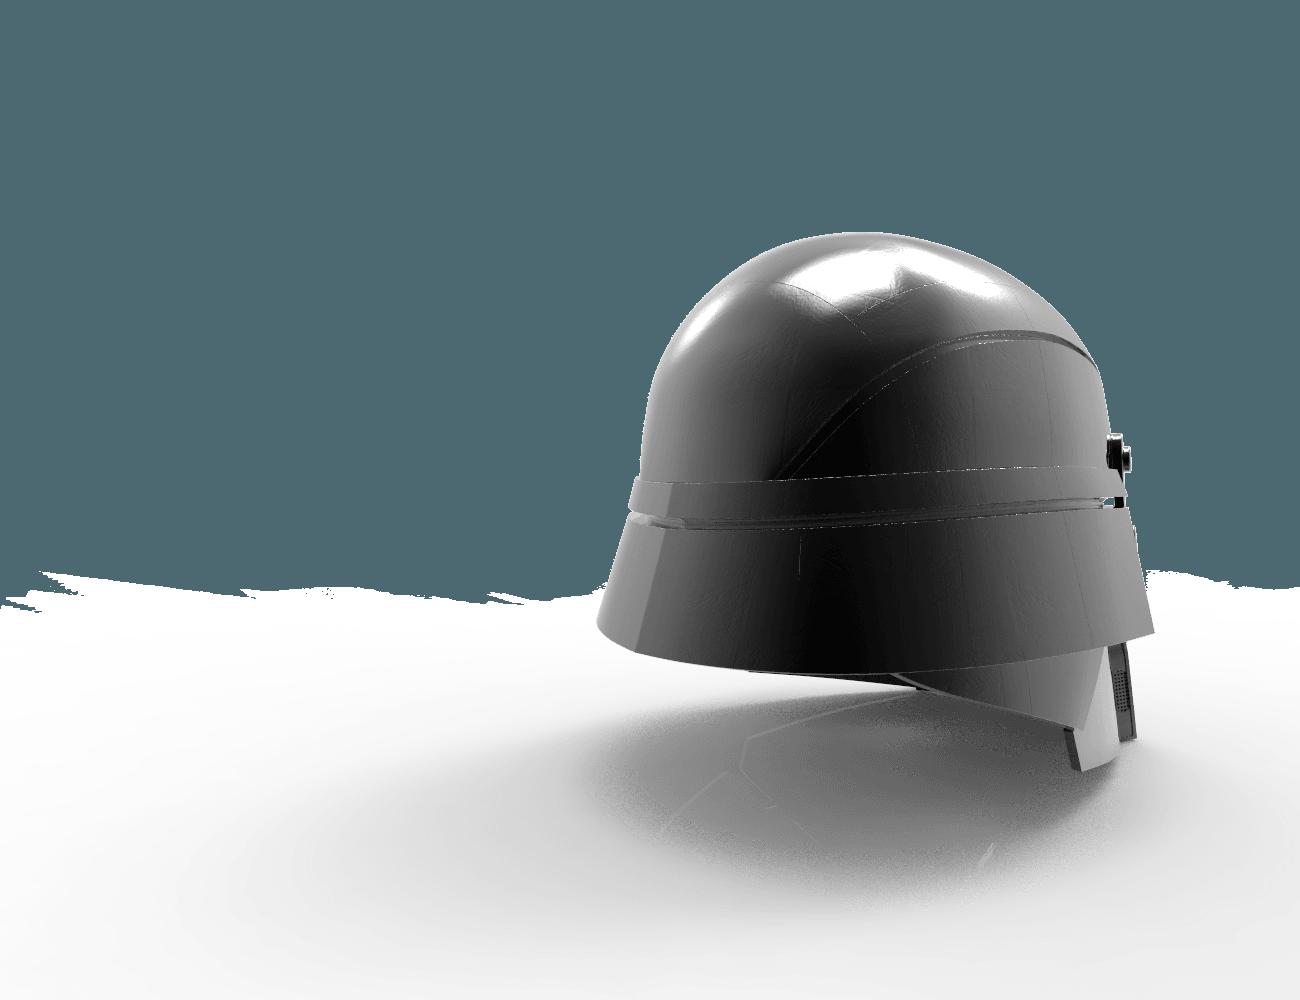 render_scene-main_render_2.31.png Download STL file Armory - Knights of Ren Helmet, StarWars model for 3D Print • 3D printing design, 3D-mon